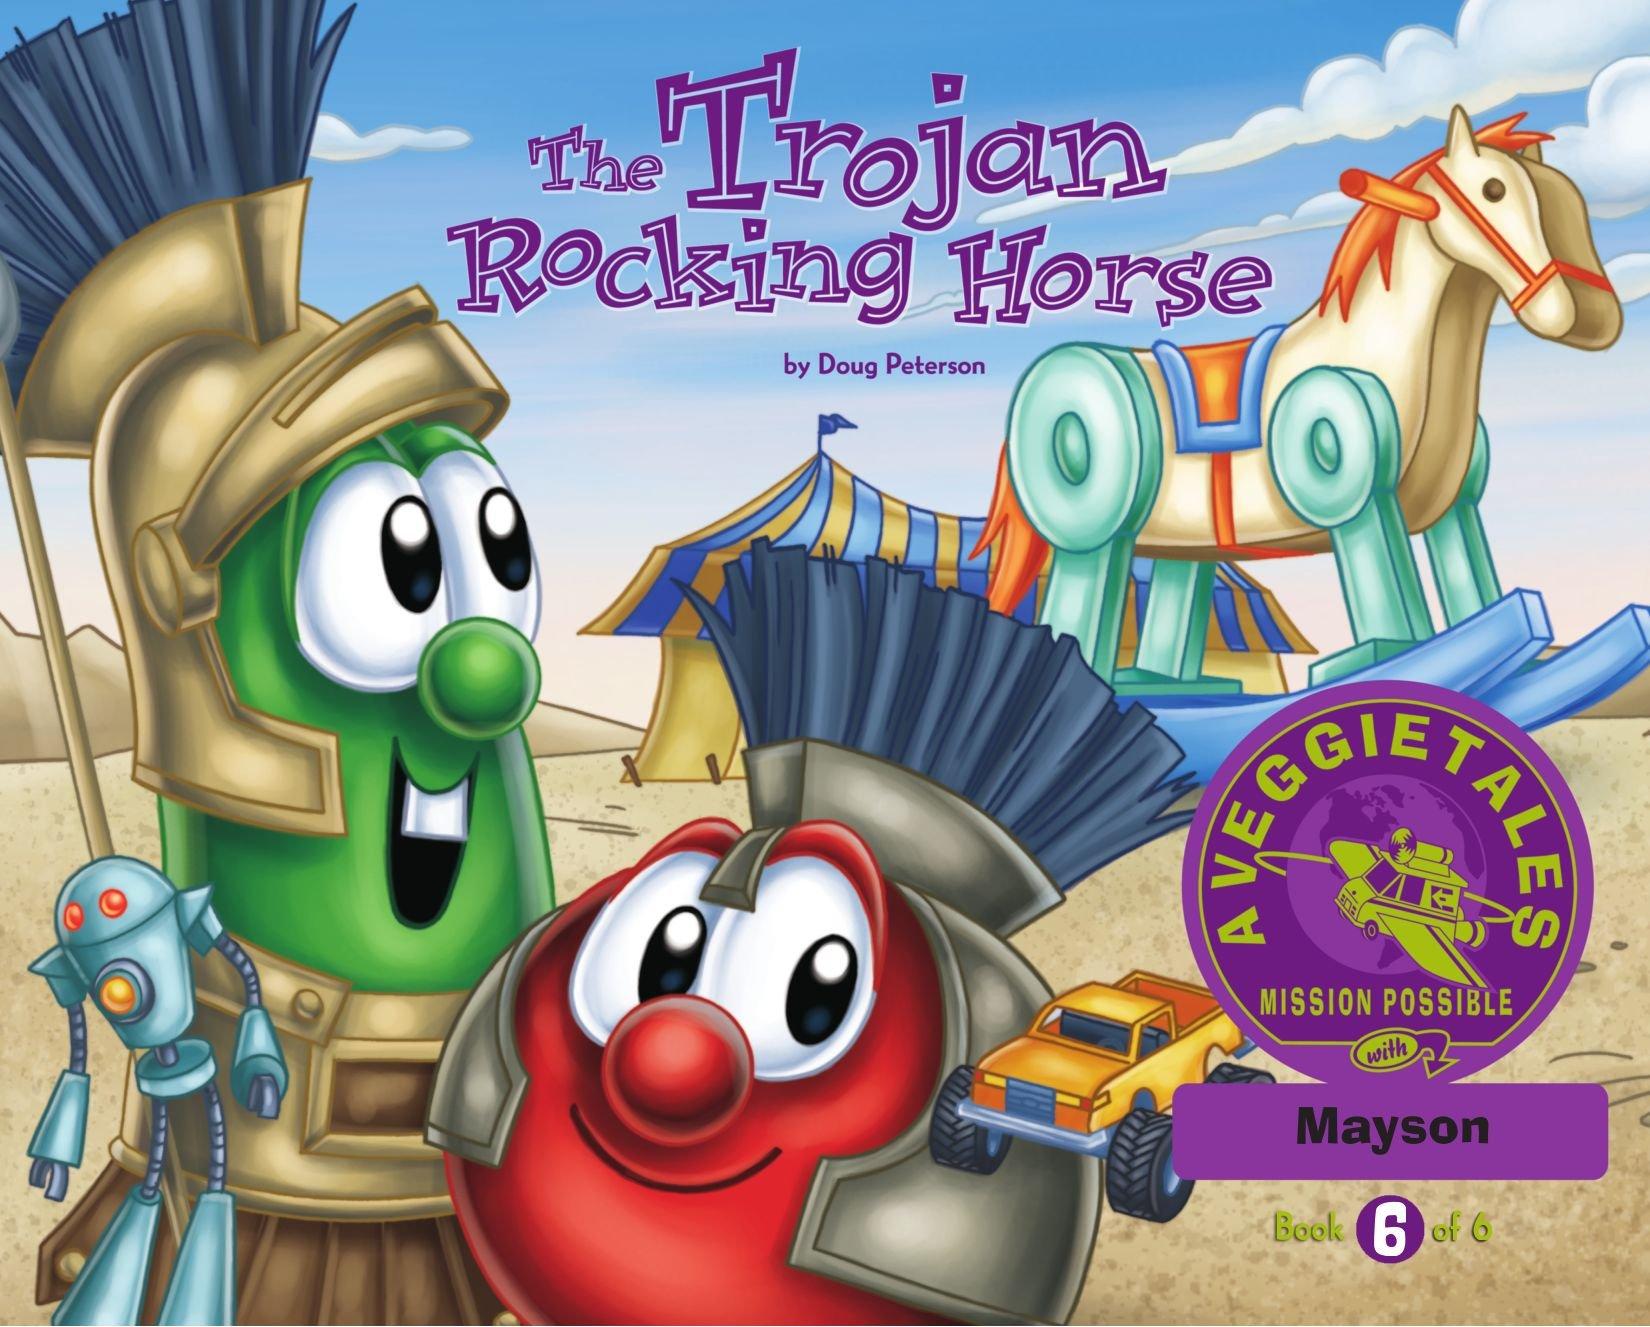 Download The Trojan Rocking Horse - VeggieTales Mission Possible Adventure Series #6: Personalized for Mayson (Boy) pdf epub